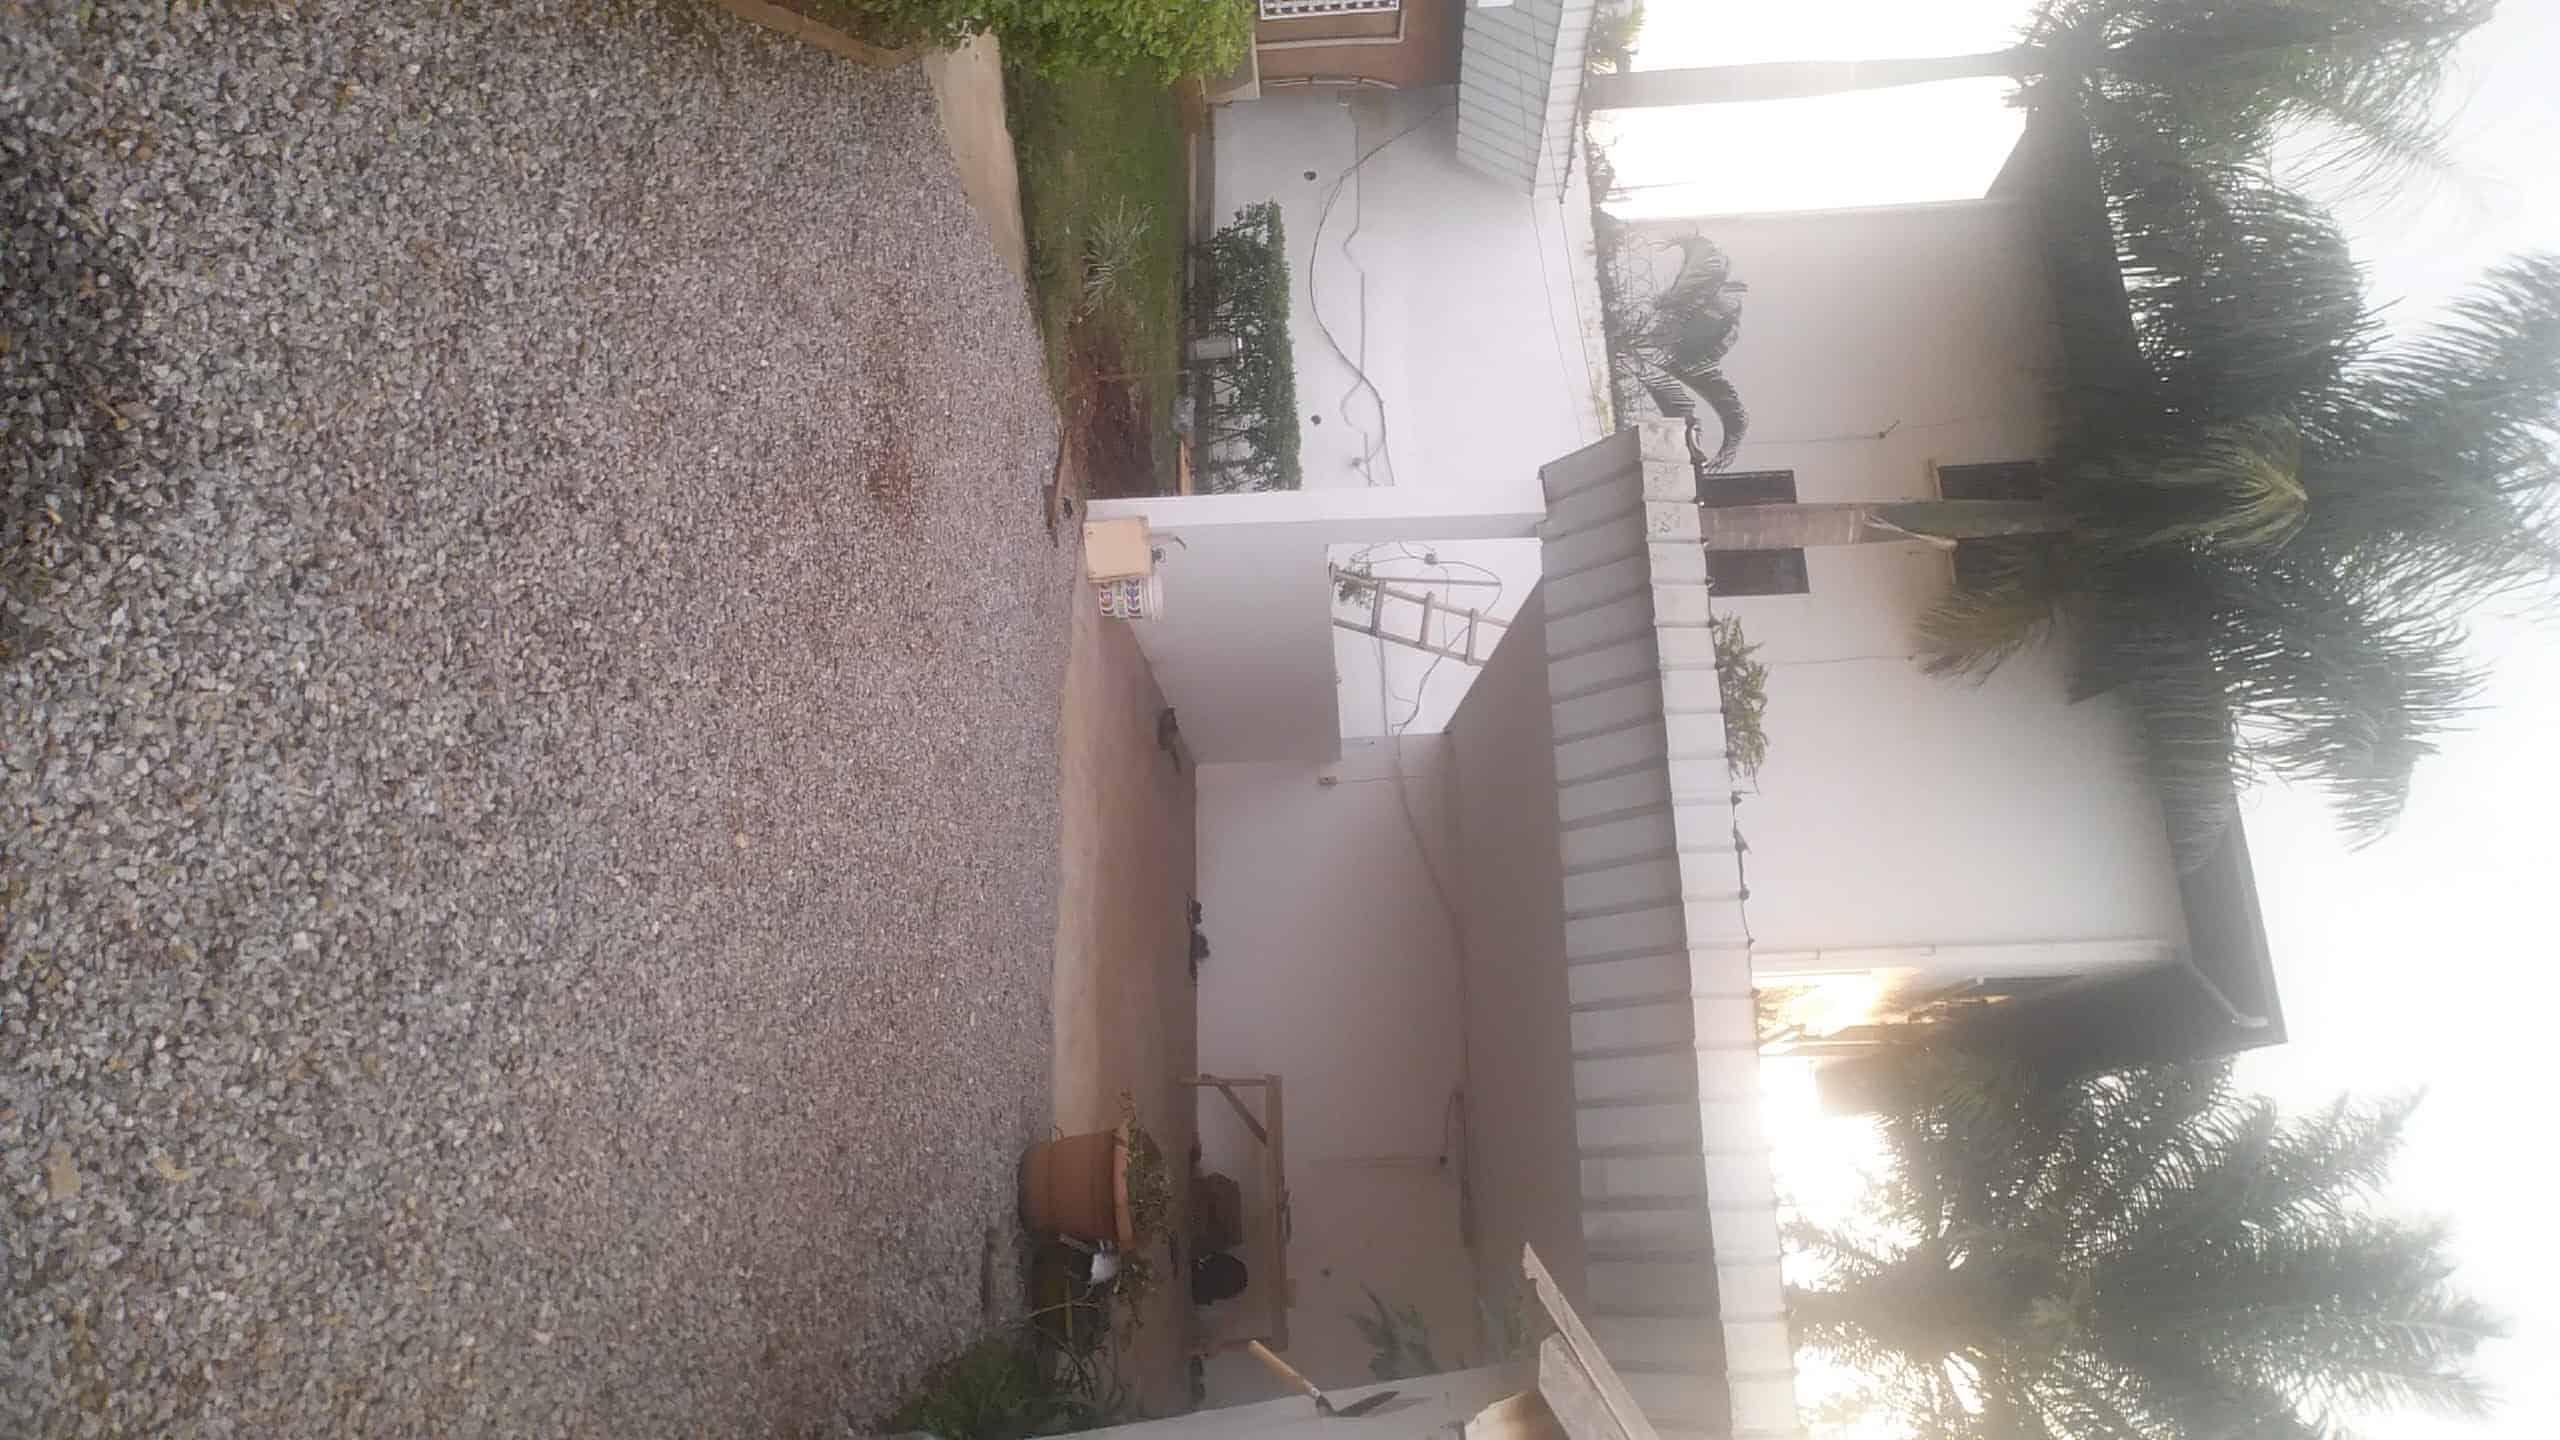 House (Villa) to rent - Yaoundé, Bastos, Mini prix bastos - 1 living room(s), 3 bedroom(s), 3 bathroom(s) - 850 000 FCFA / month